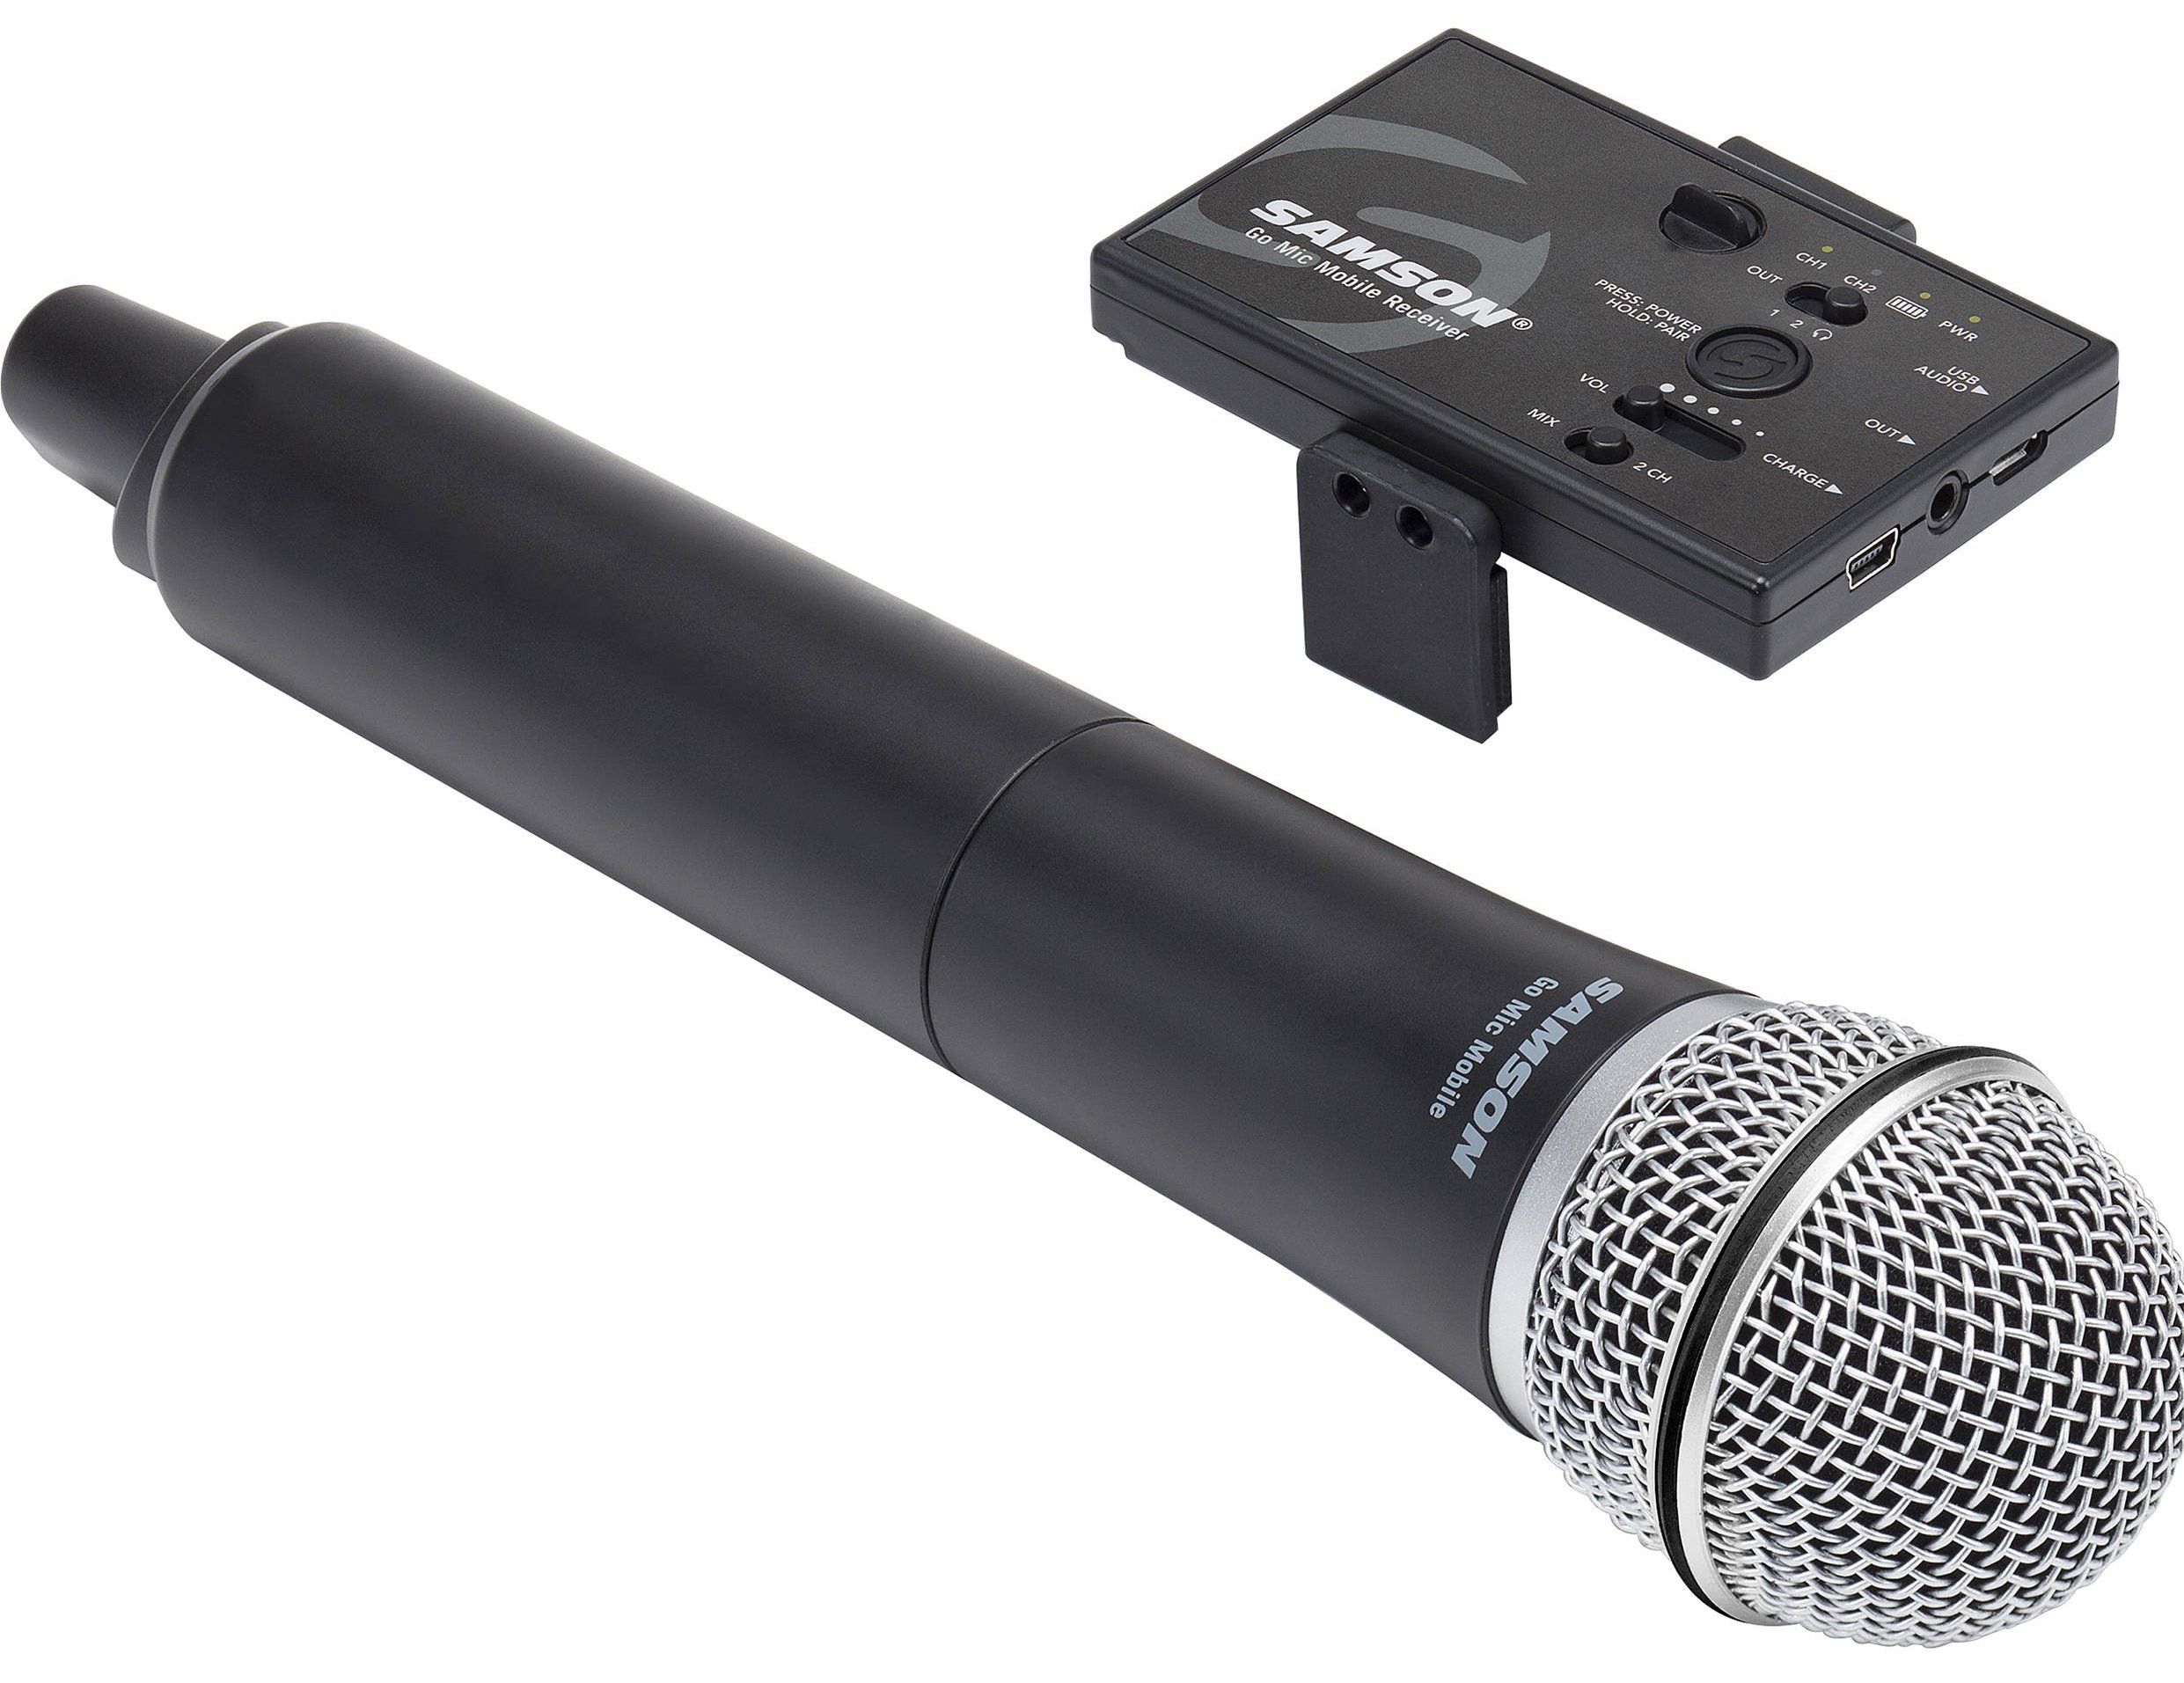 samson-go-mic-mobile-handheld-system-.jpeg